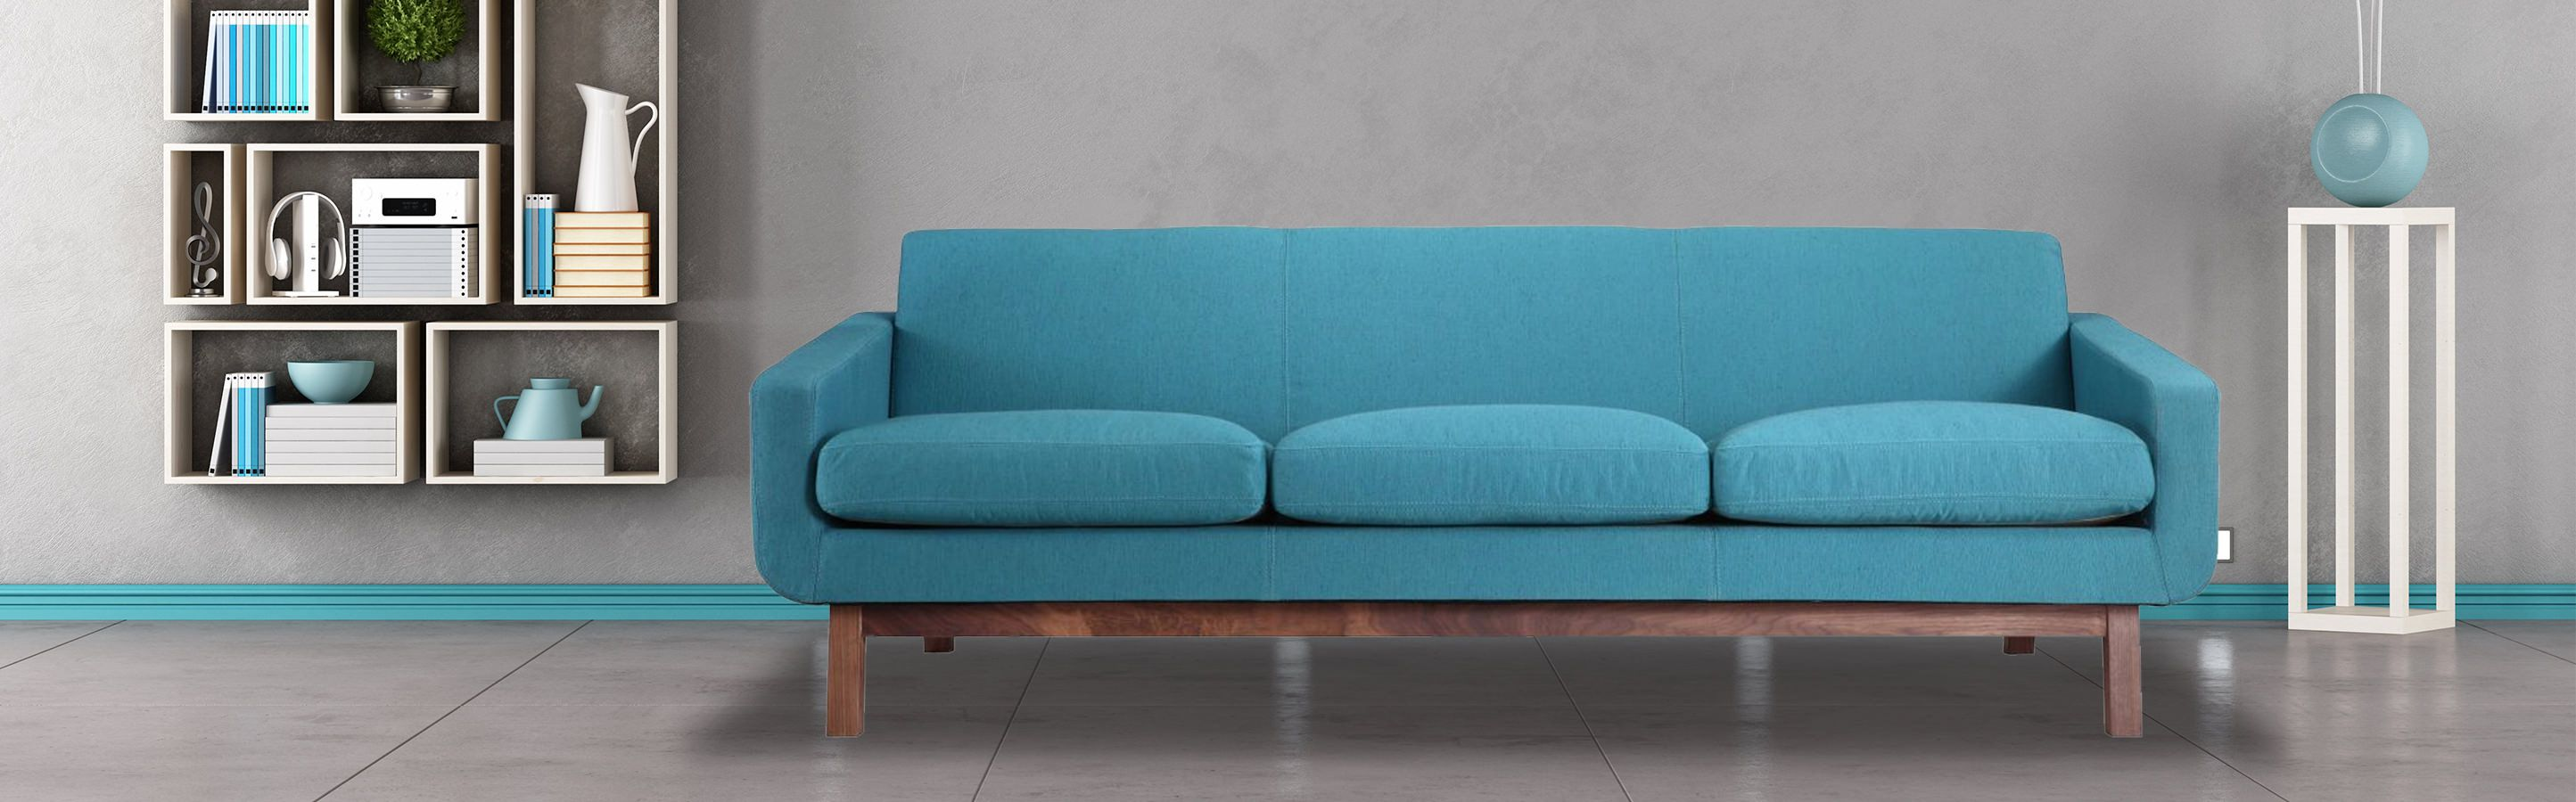 Platform Mid Century Modern Sofa